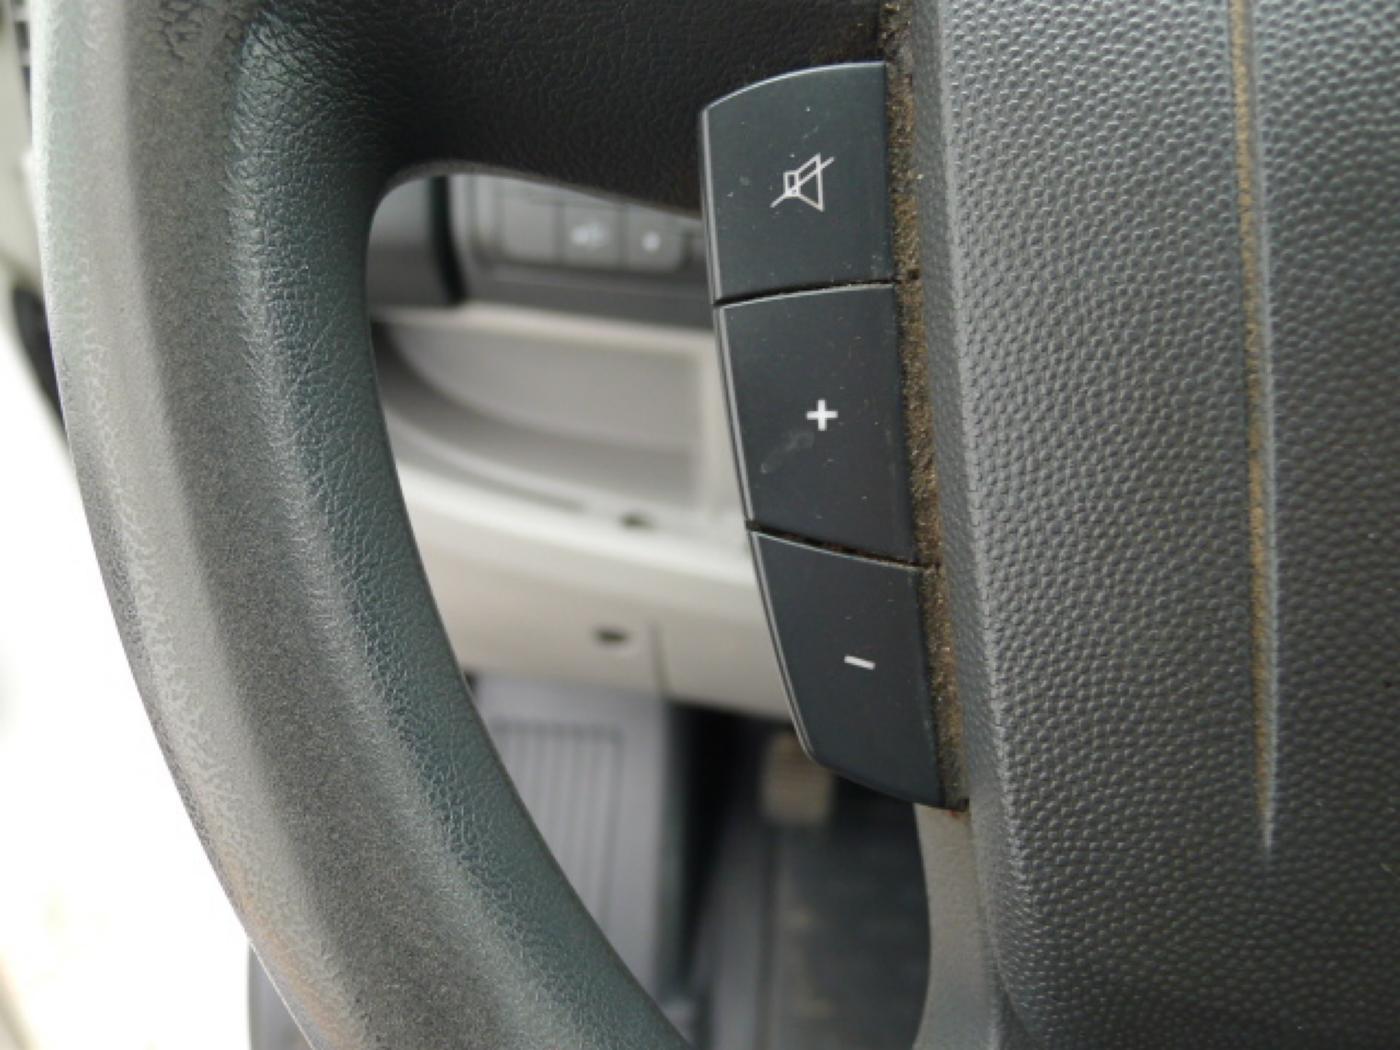 Peugeot Boxer 2.2 HDI L2H2 Klima Akce!!! Novinka - 14